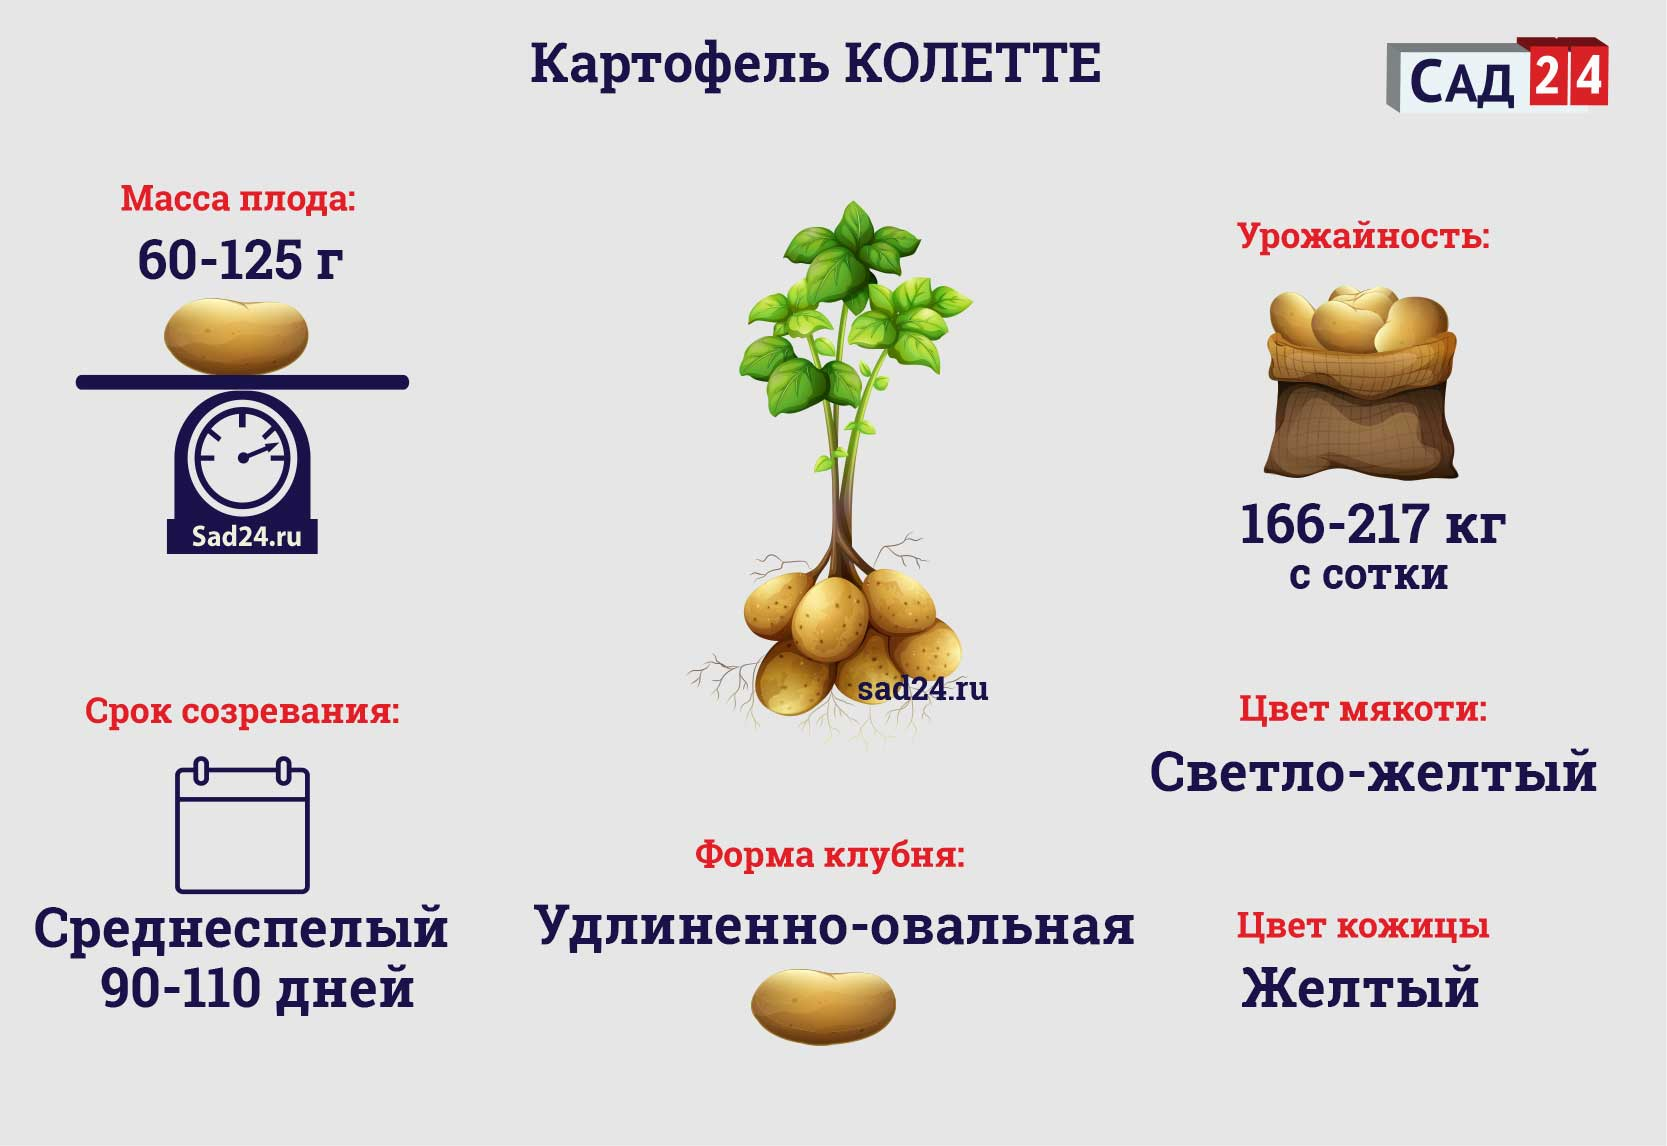 Колетте - https://sad24.ru